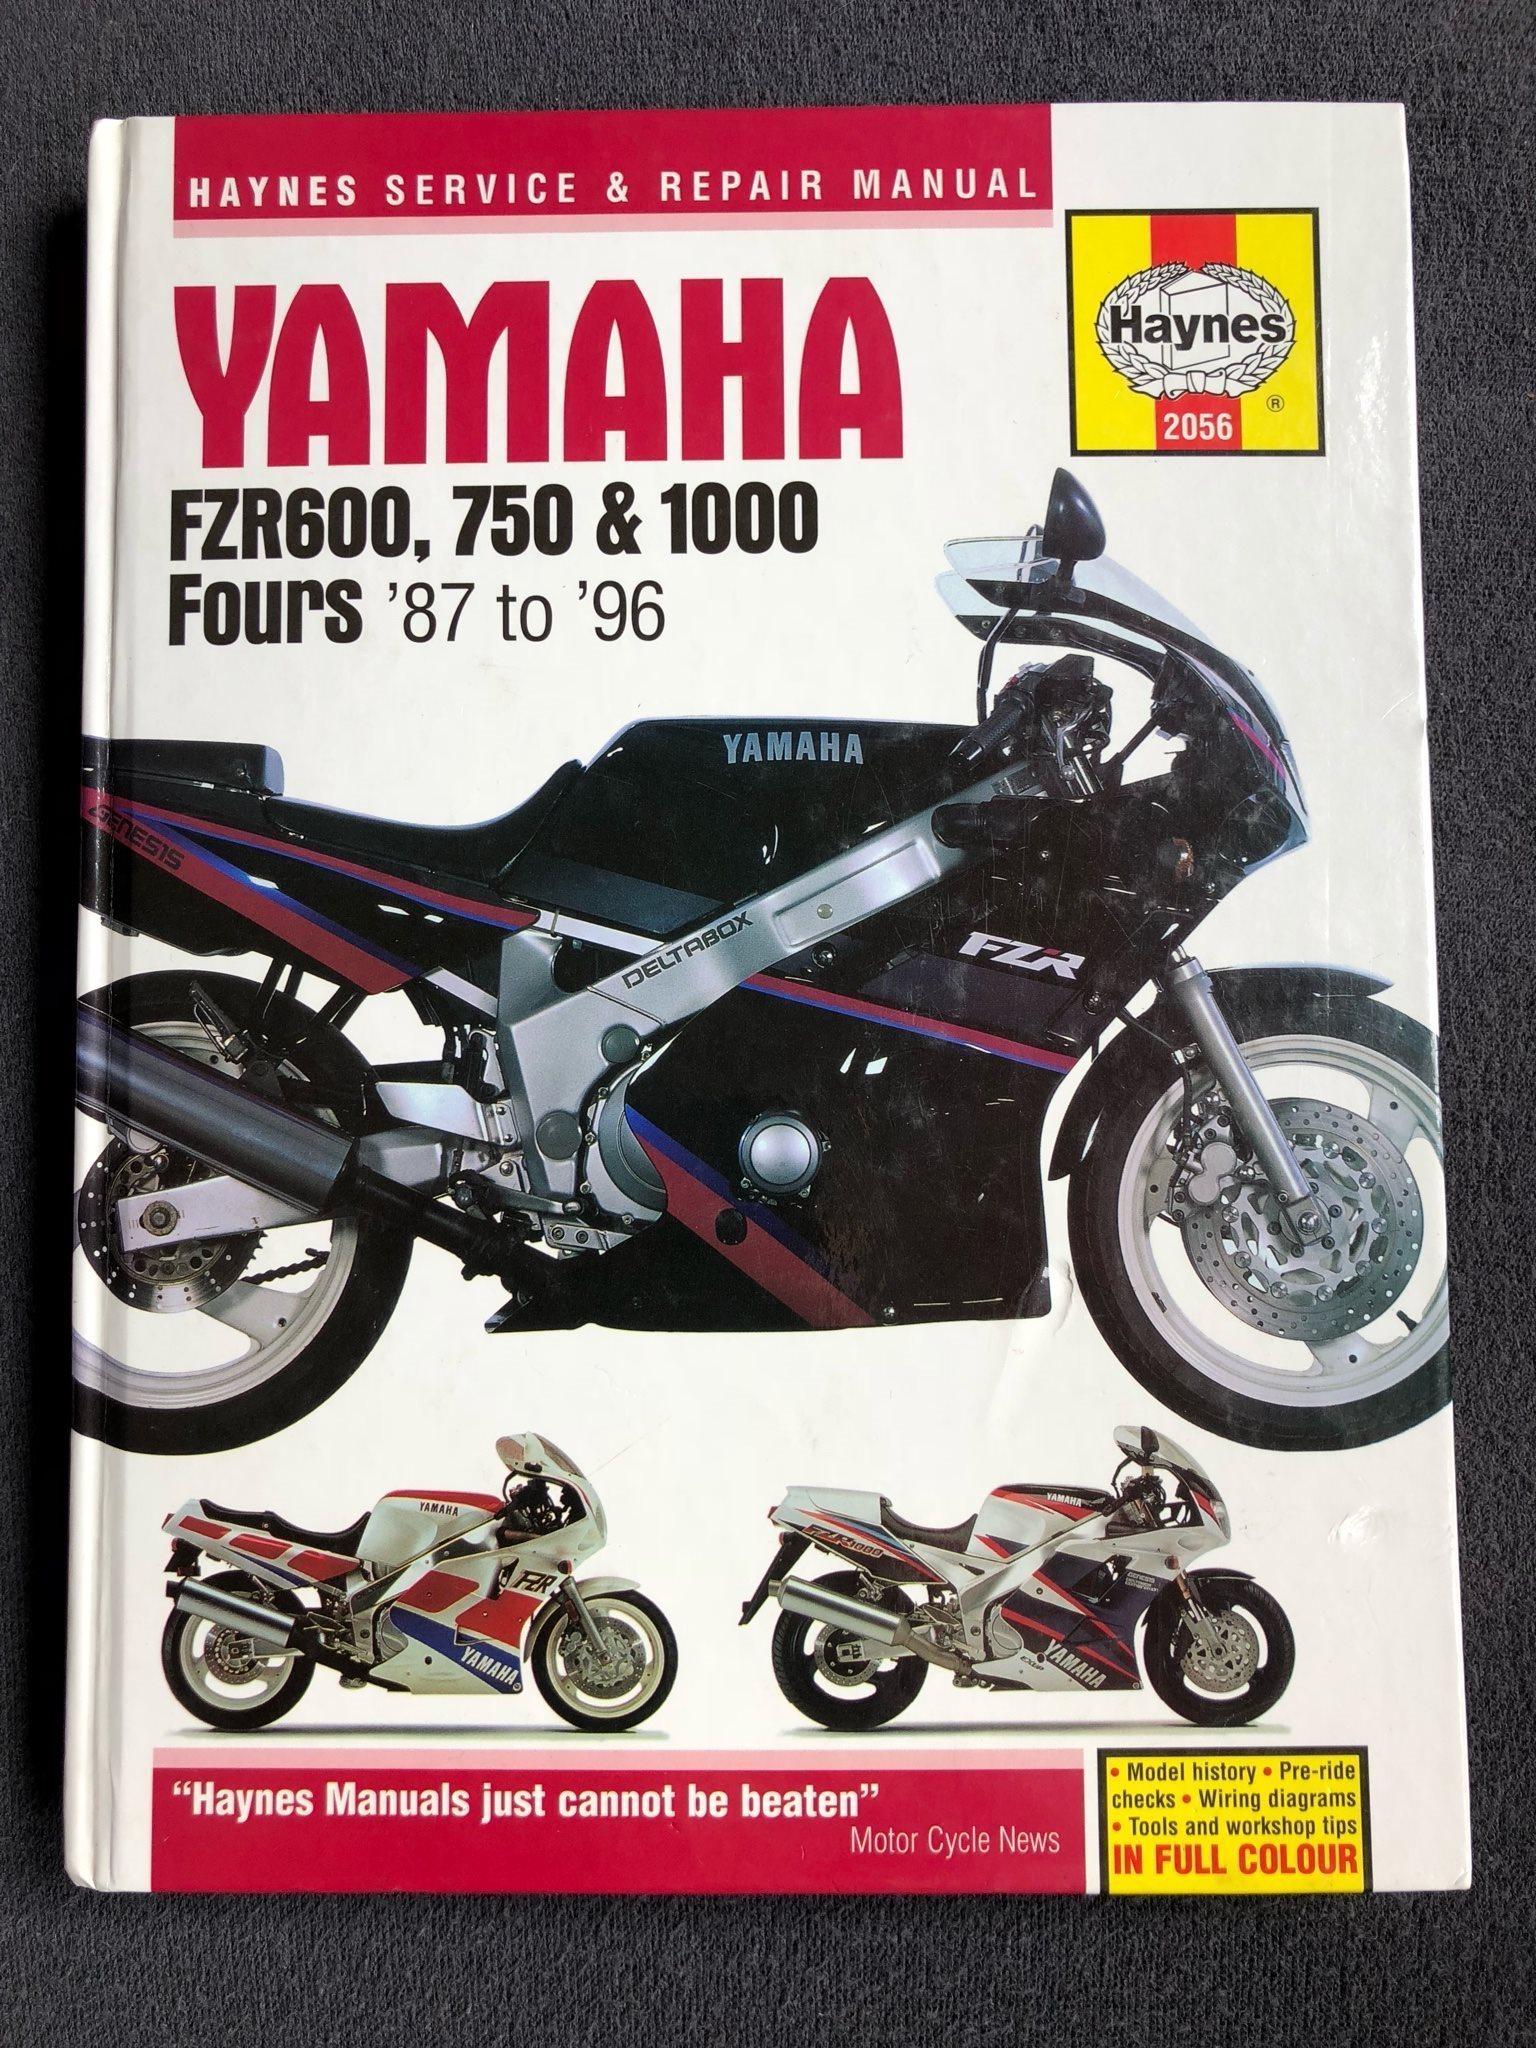 Yamaha FZR 600, 750, 1000 4-cyl. 1987-96. H.. (309639688) ᐈ Köp på ...